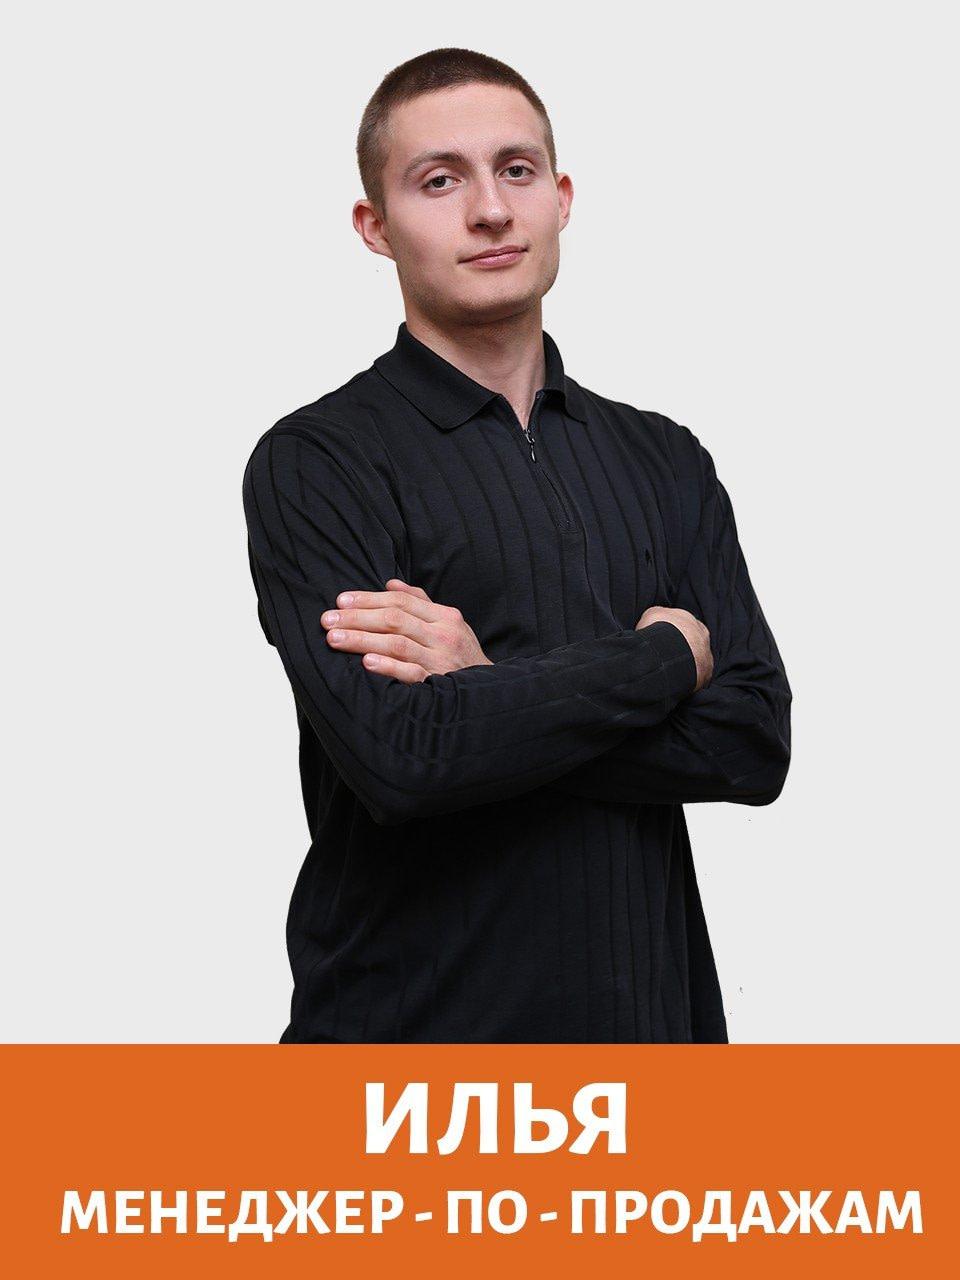 ilja menedzher po prodazham - Создание и разработка сайтов в Актобе